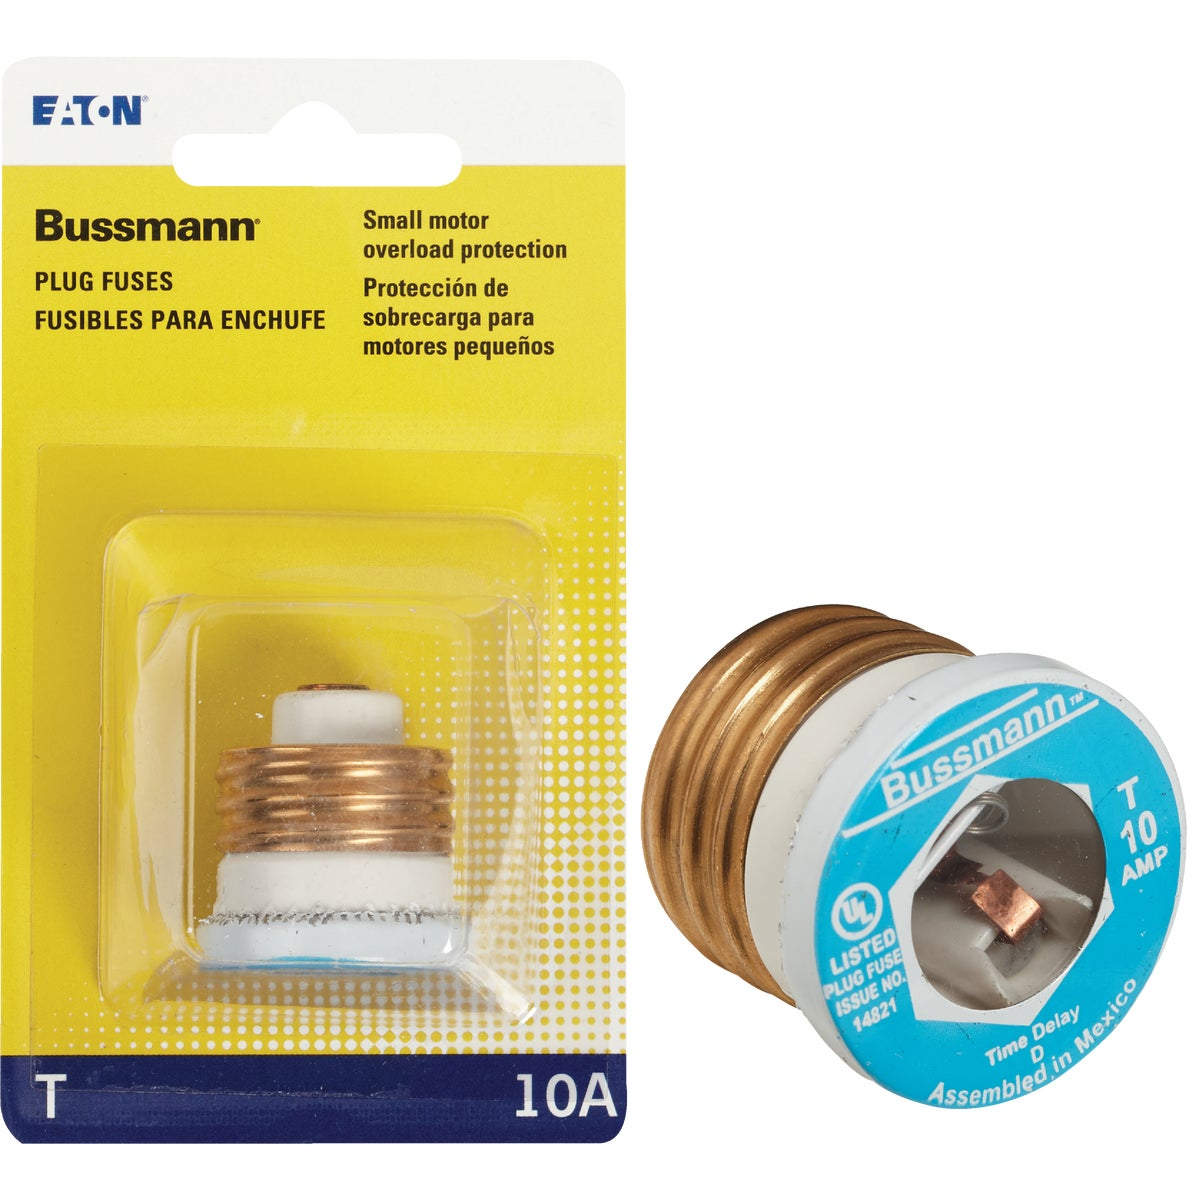 10A PLUG FUSE - BP/T-10 by Bussmann Cooper